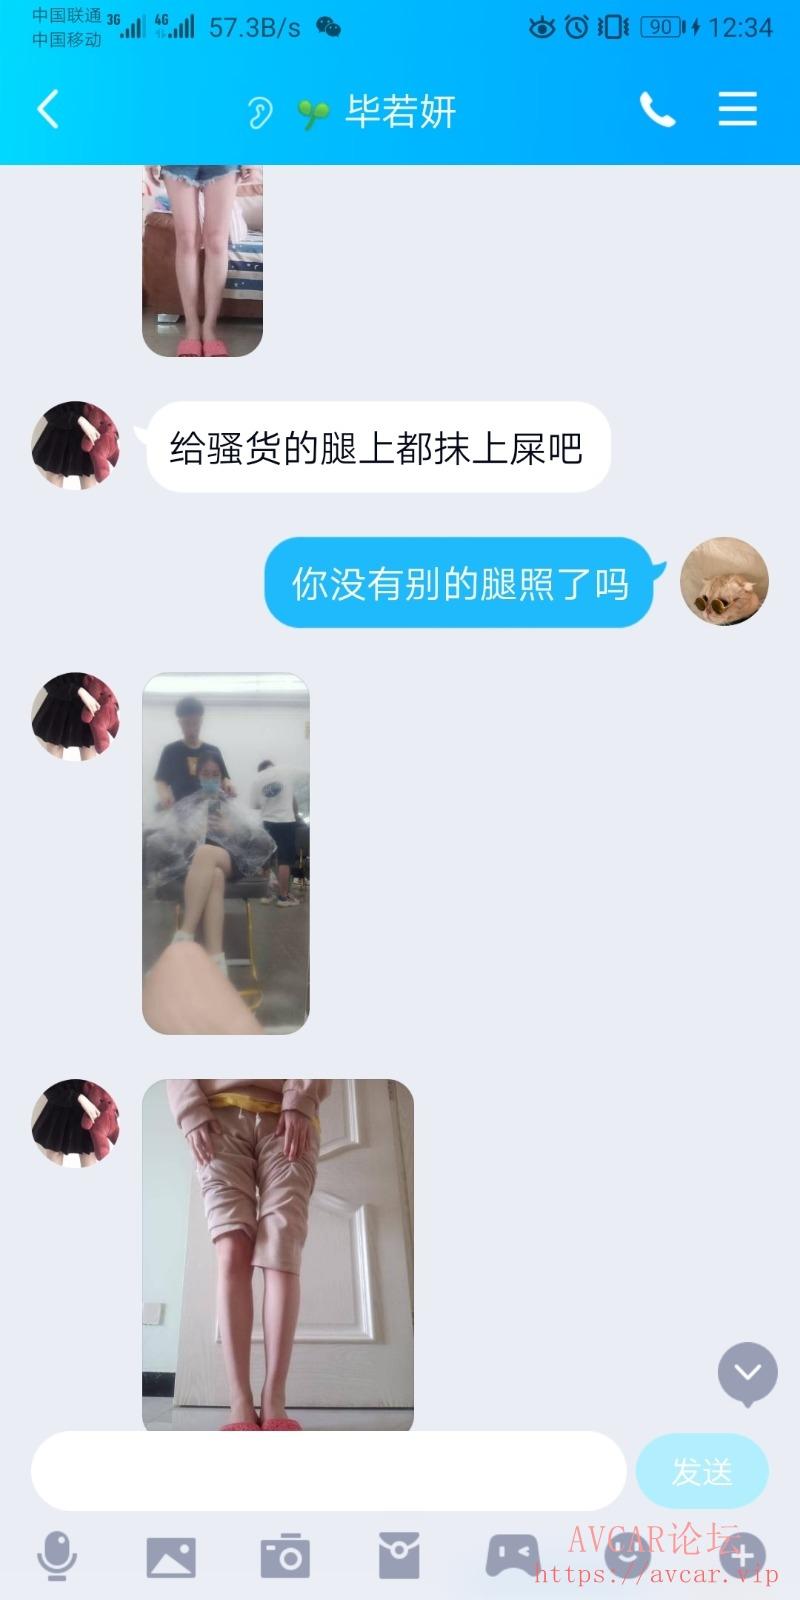 Screenshot_20210720_123423_com.tencent.mobileqq.jpg